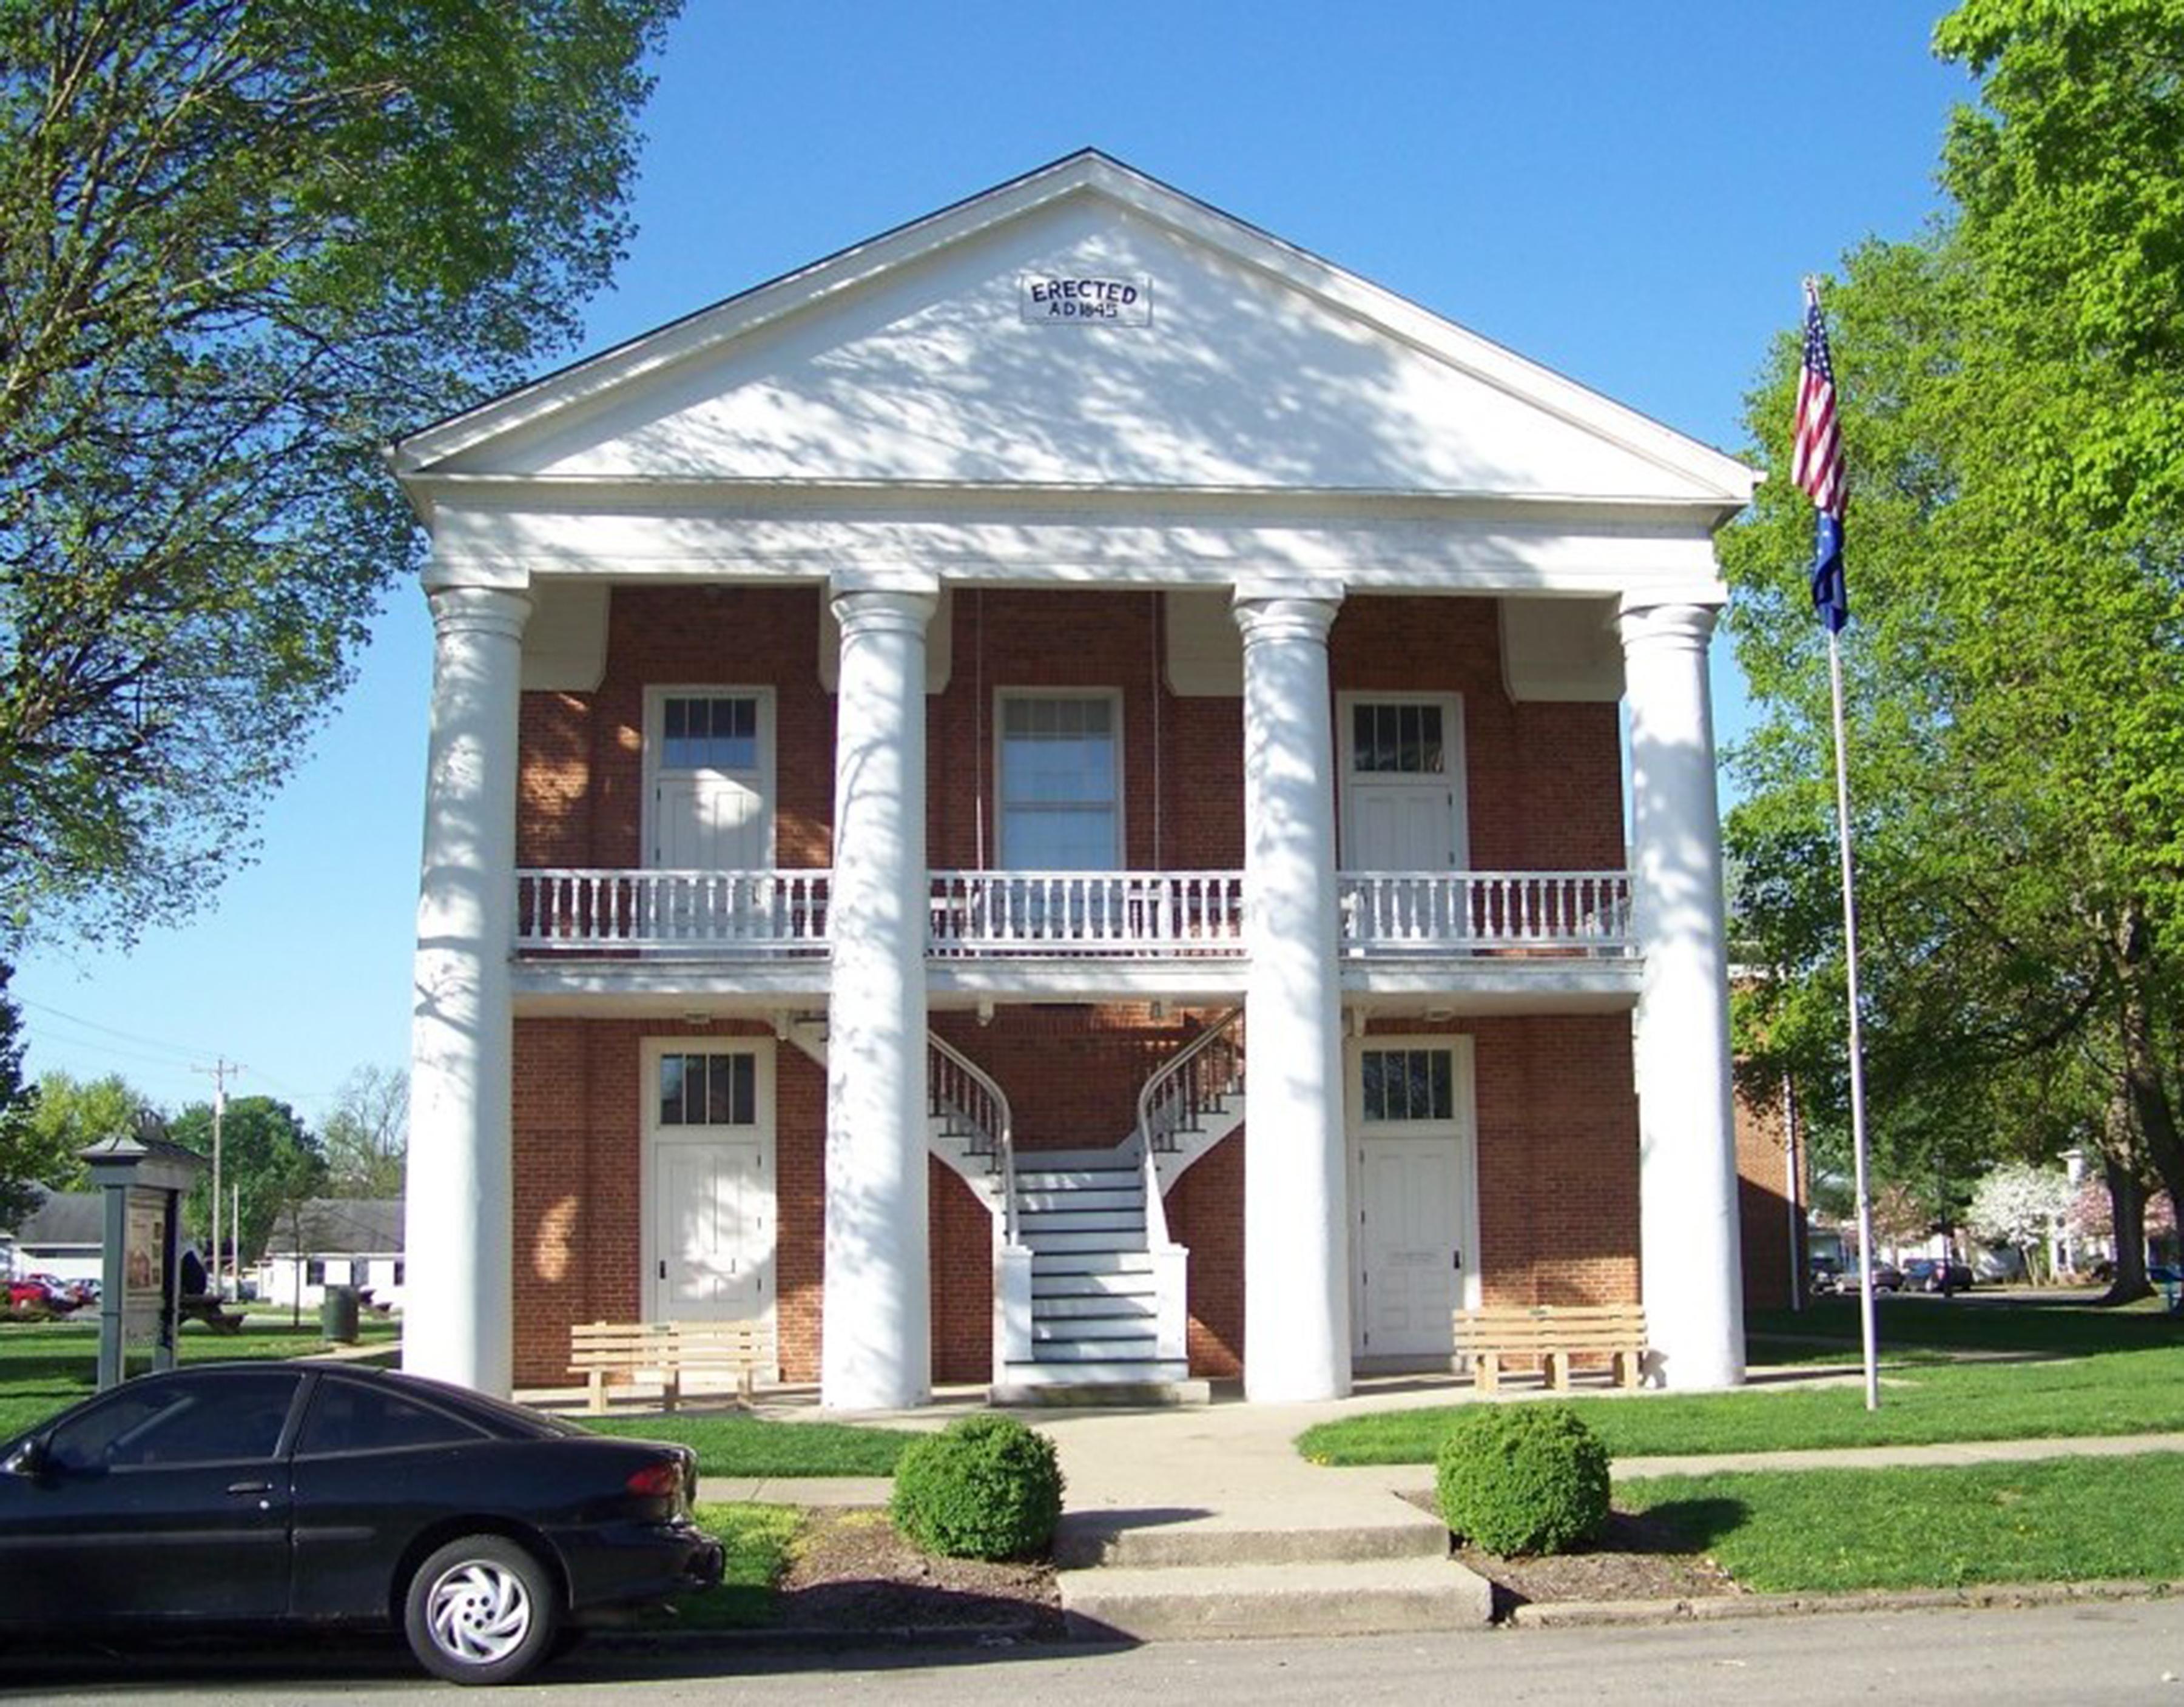 Ohio County Courthouse